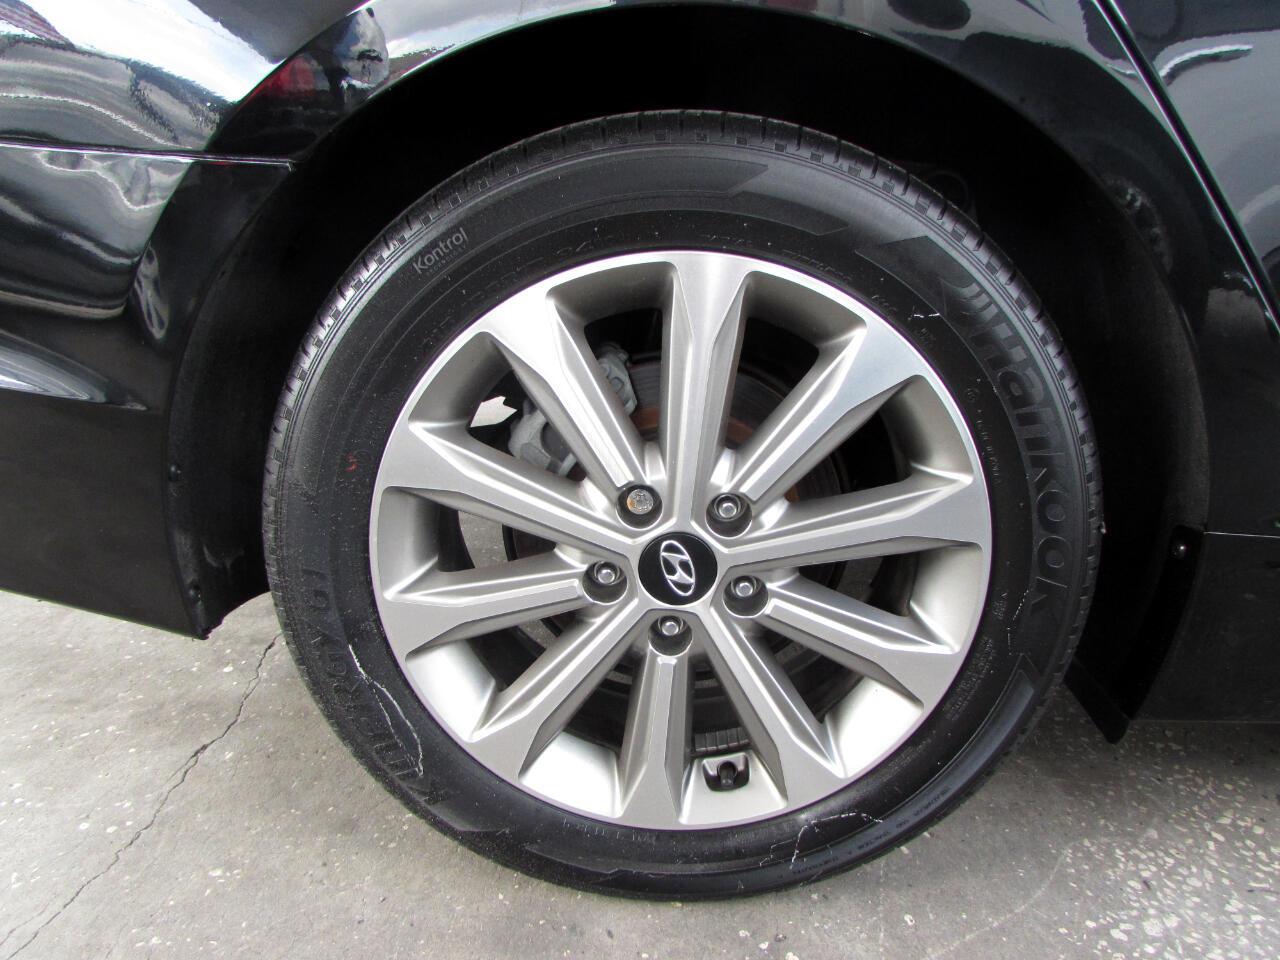 2017 Hyundai Sonata Limited 2.4L